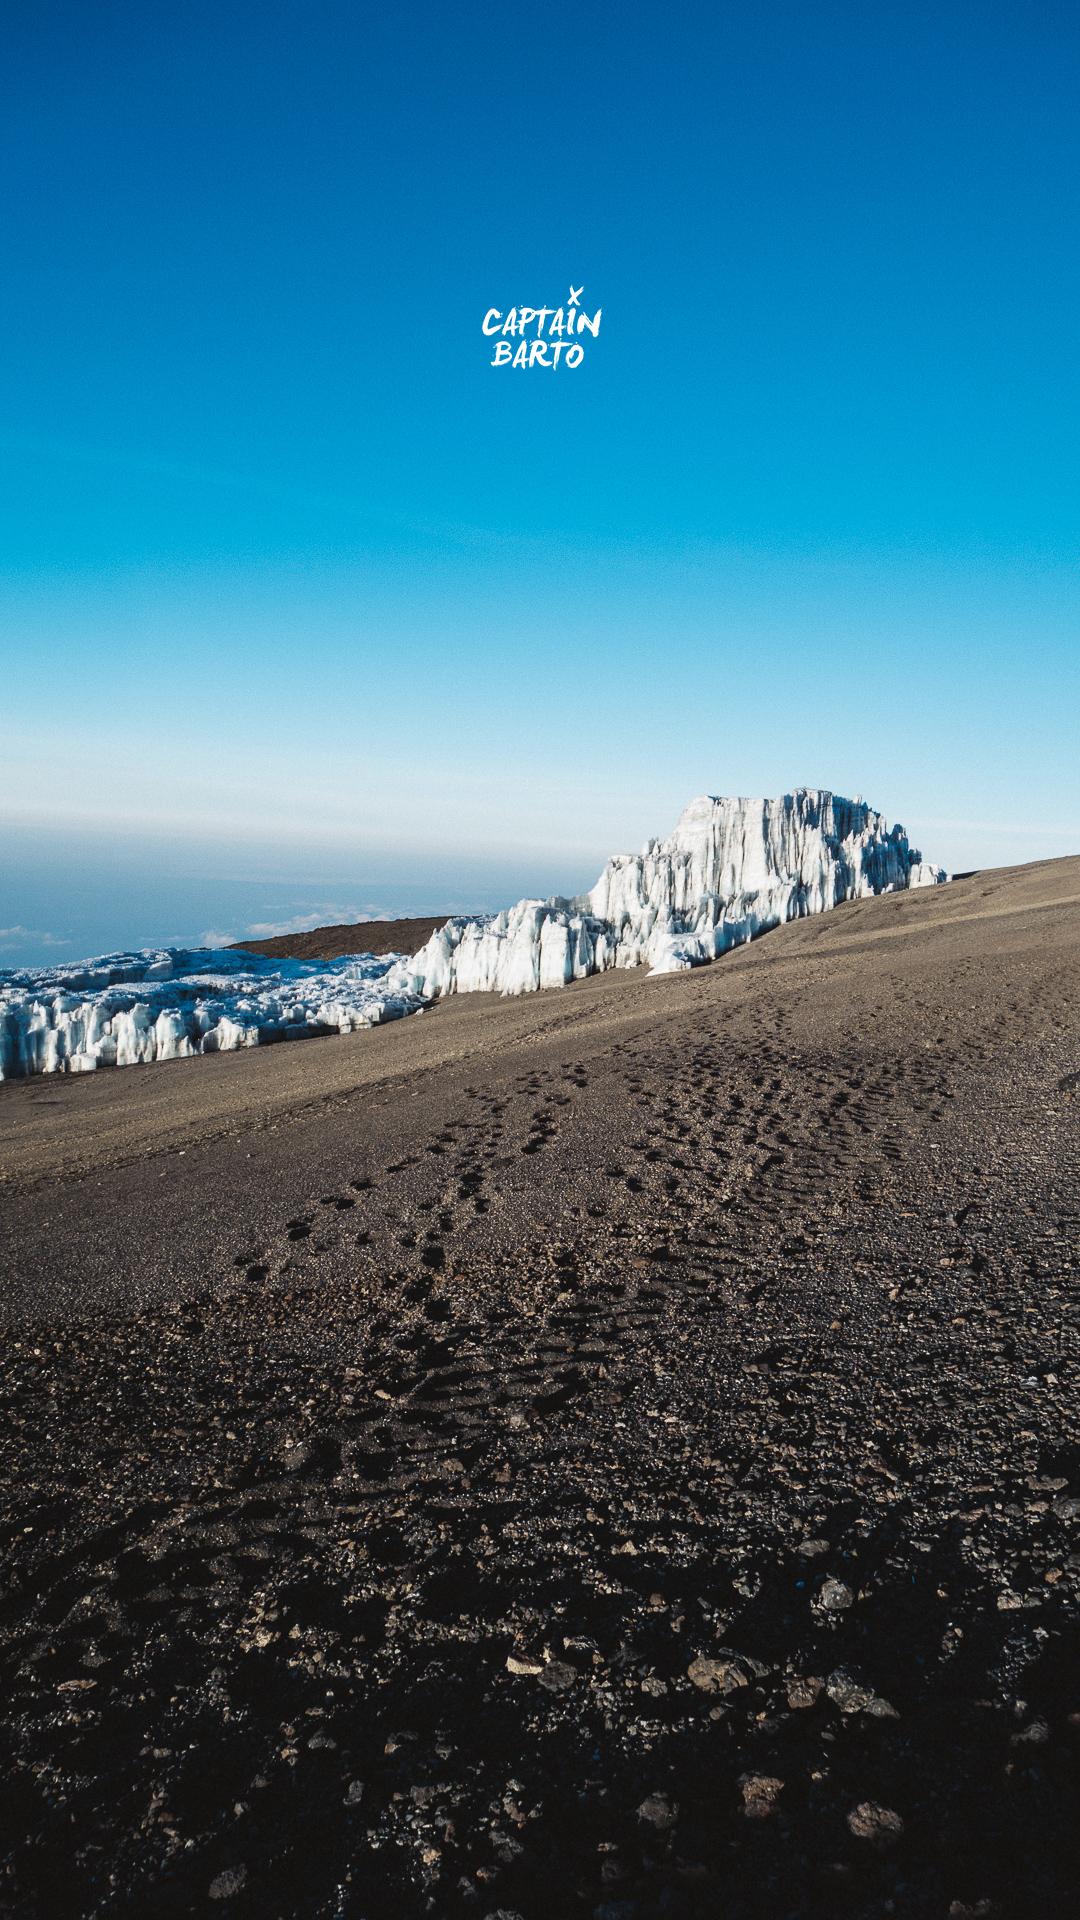 captainbarto-blog-wallpaper-climbing-mtkilimanjaro-110817-13.jpg